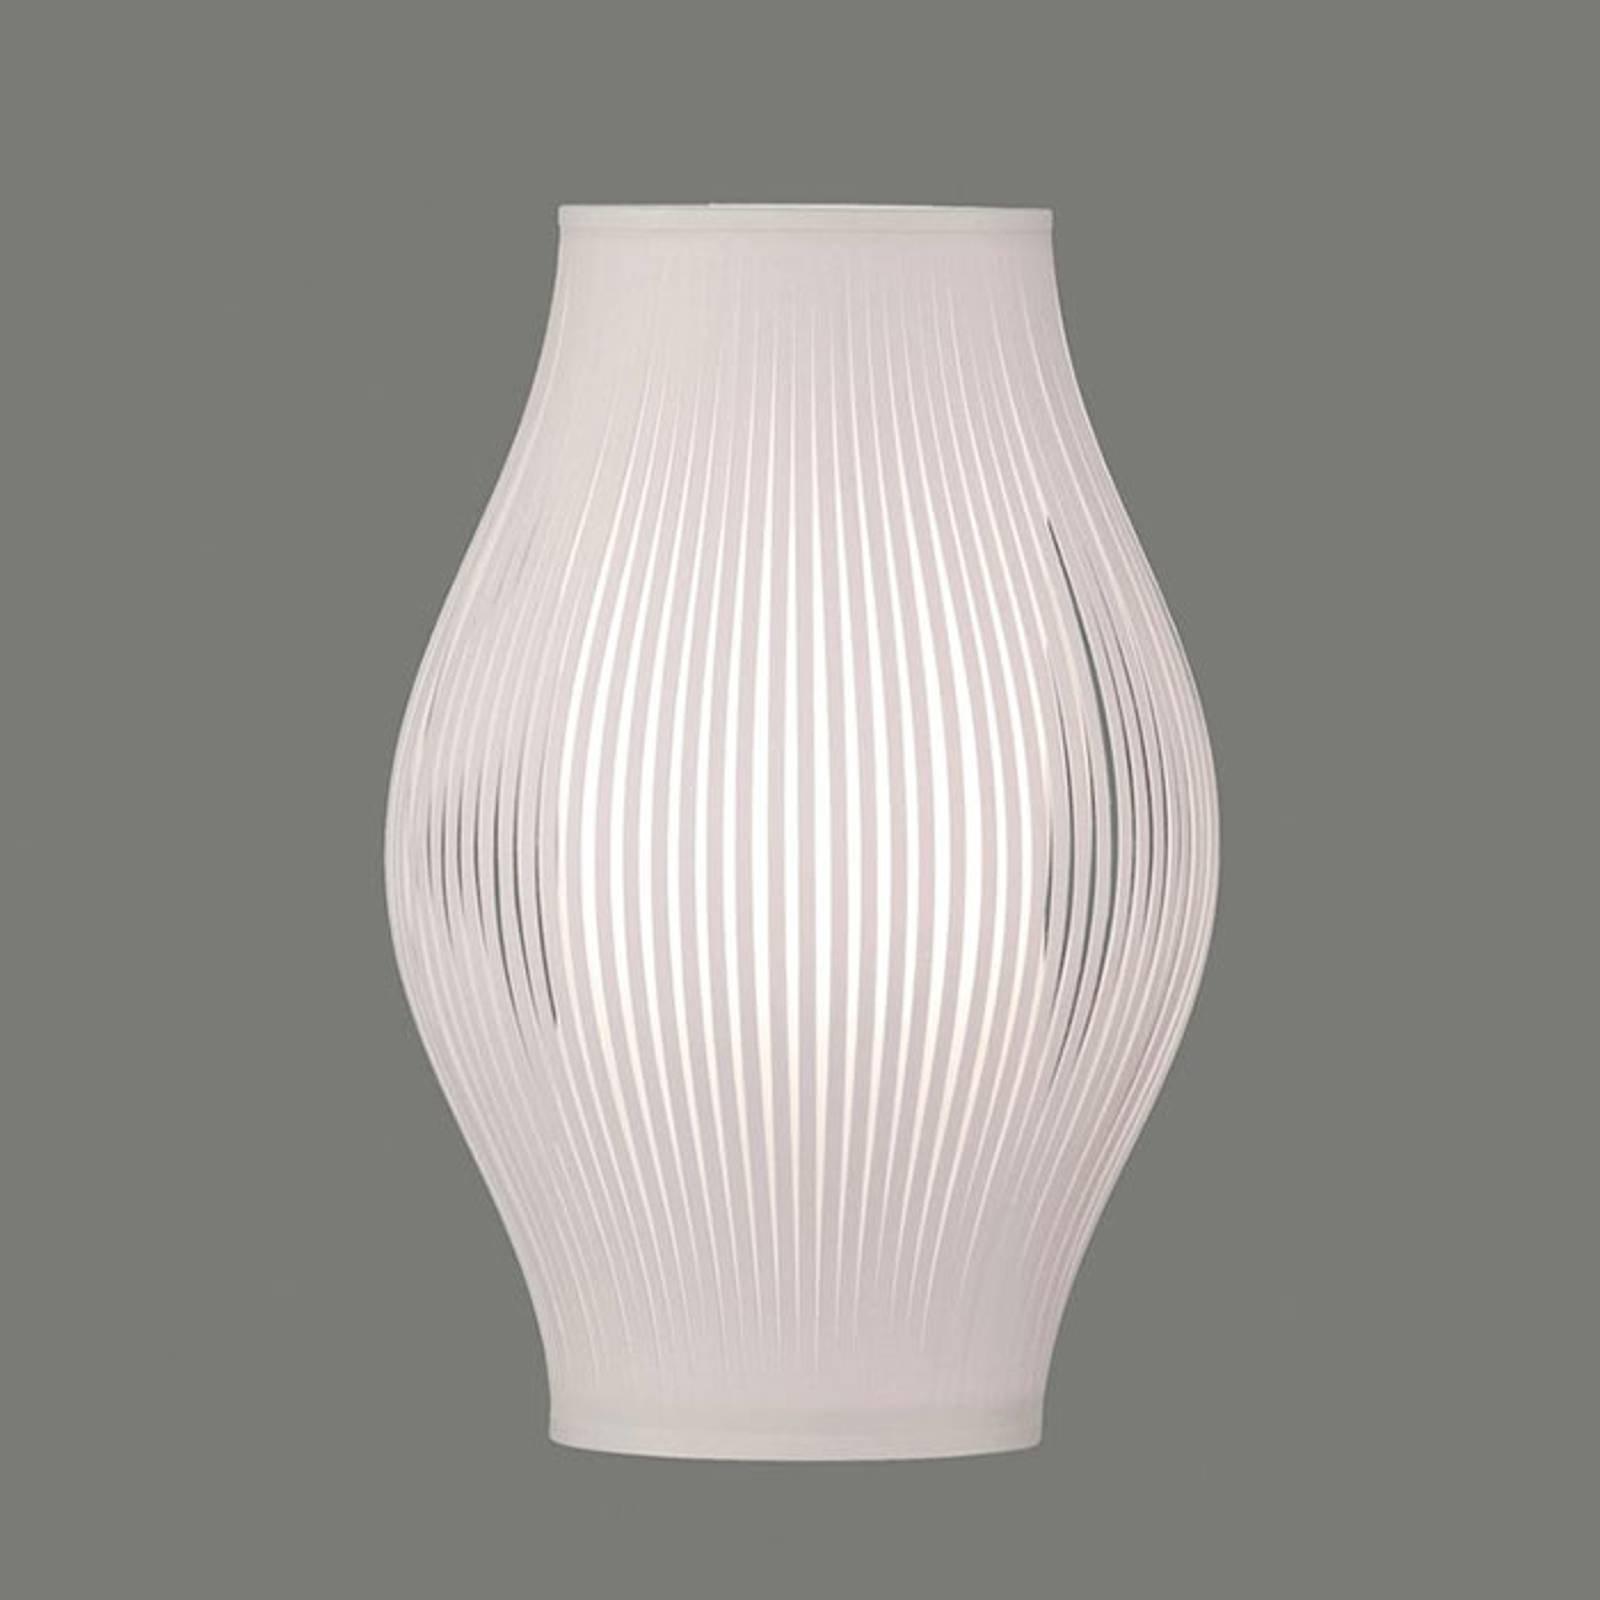 Bordlampe Murta, 36 cm, hvit